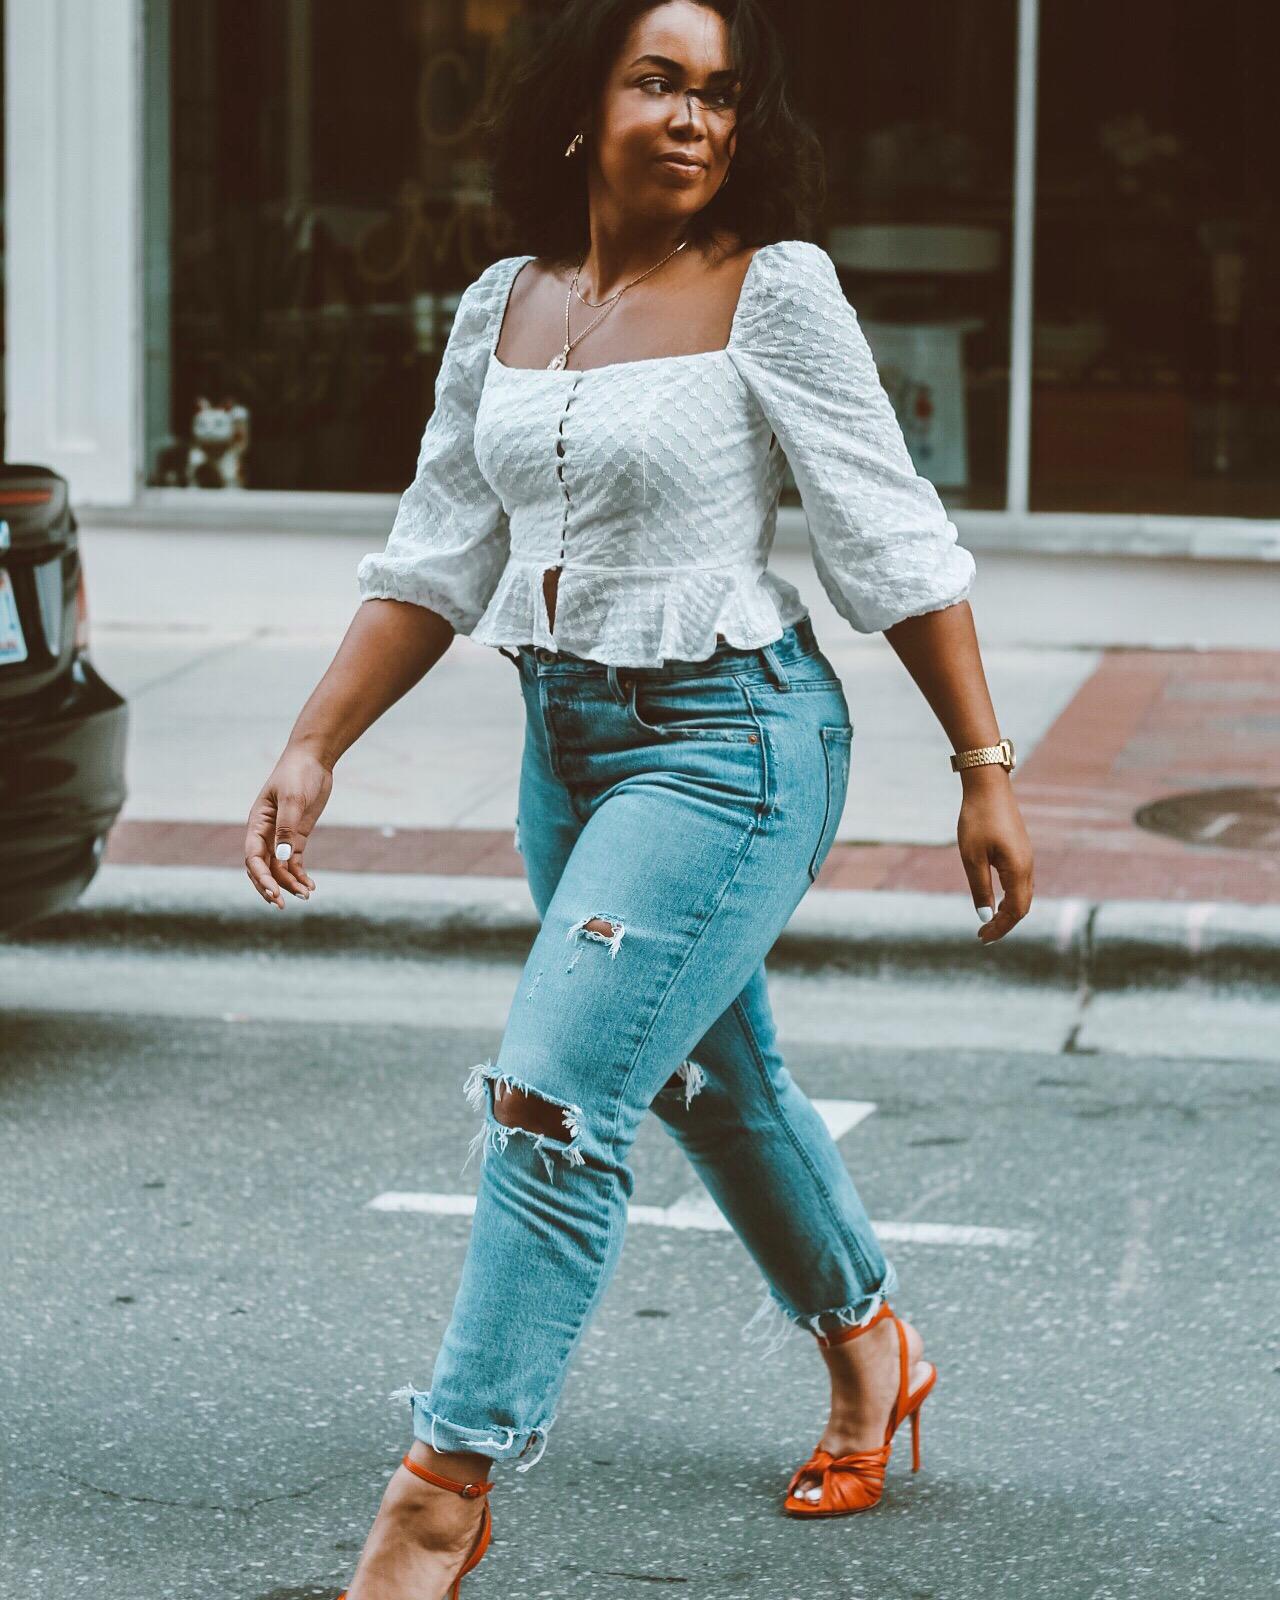 Forever-21-eyelet-blouse-gap-cone-denim-distressed-jeans-zara-orange-leather-heels-6.JPG